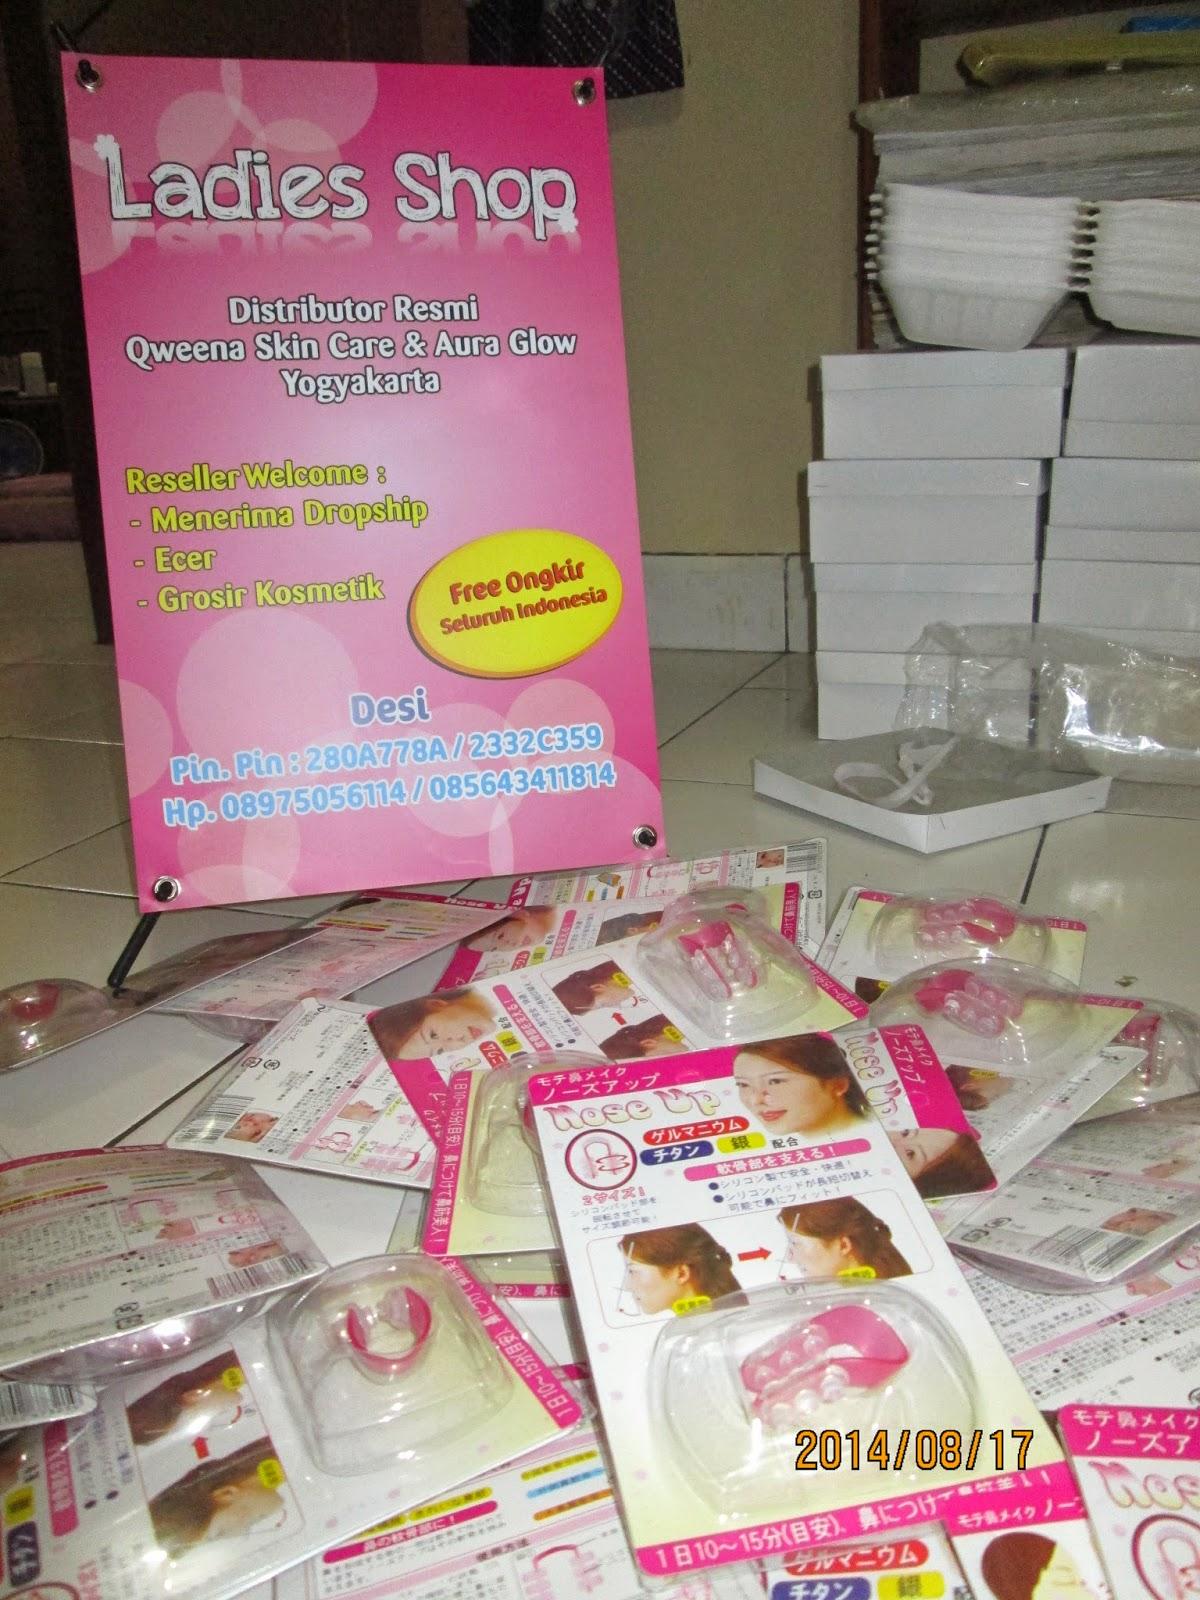 Katalog Produk Kosmetik Dan Kesehatan Nose Up Noseup Pemancung Hidung Clipper Teknologi Jepang